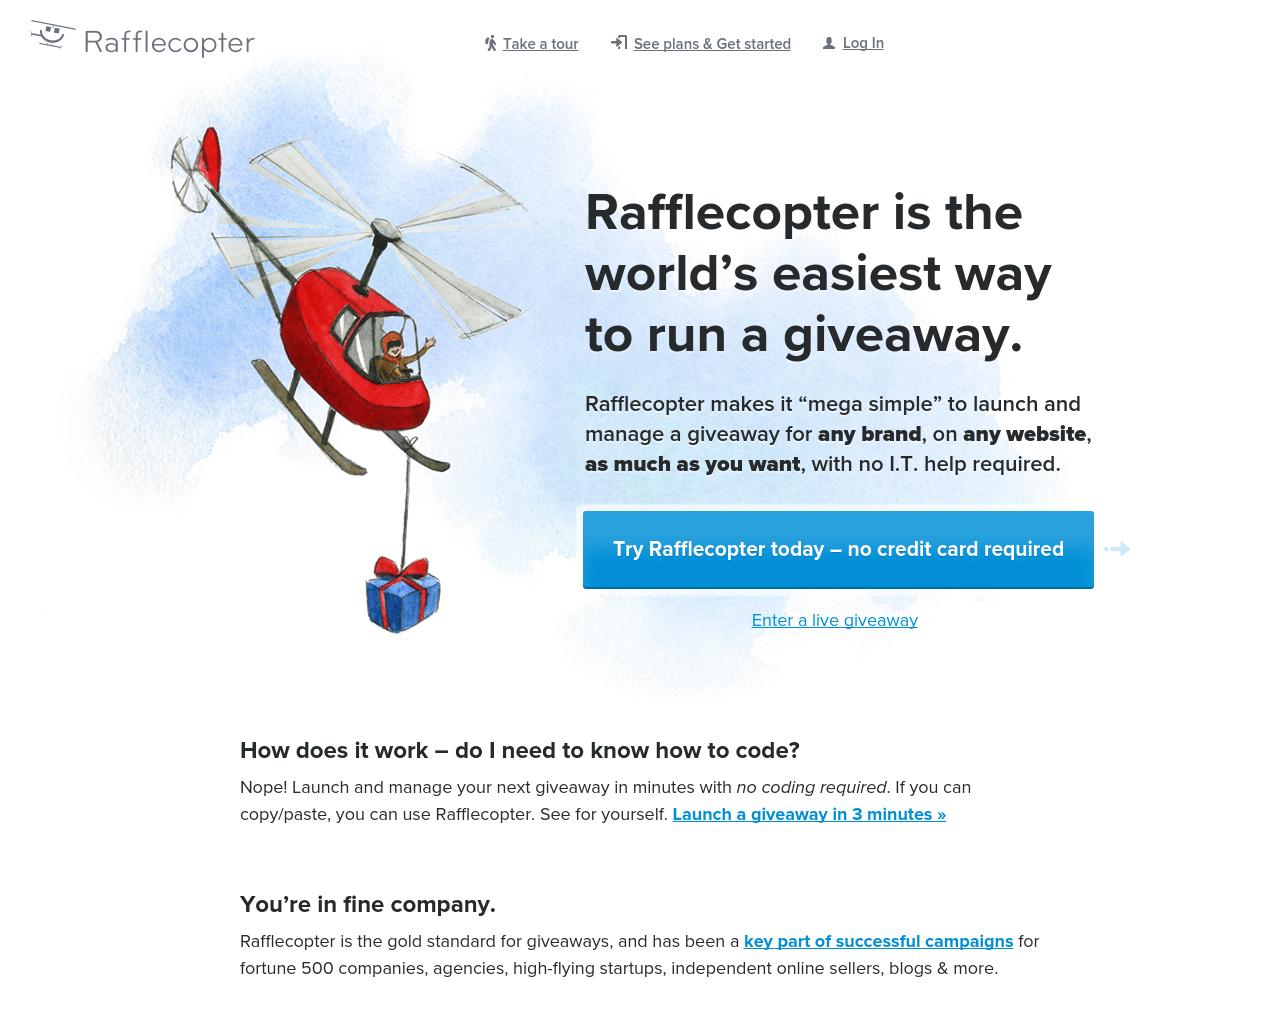 Rafflecopter-Marketplace-Advertising-Reviews-Pricing